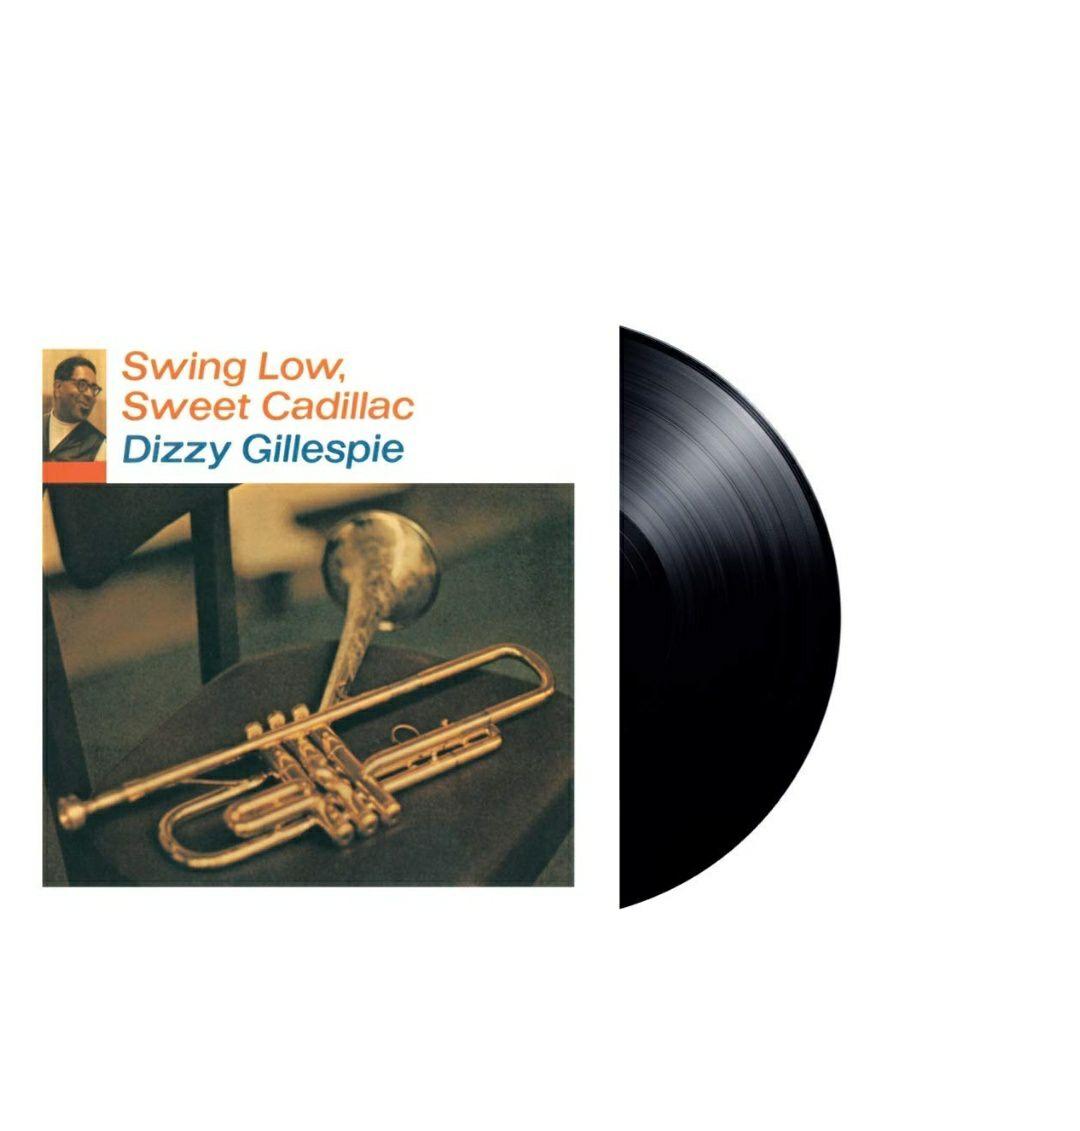 Dizzy Gillespie - Swing Low, Sweet Cadillac (Vinyl LP)